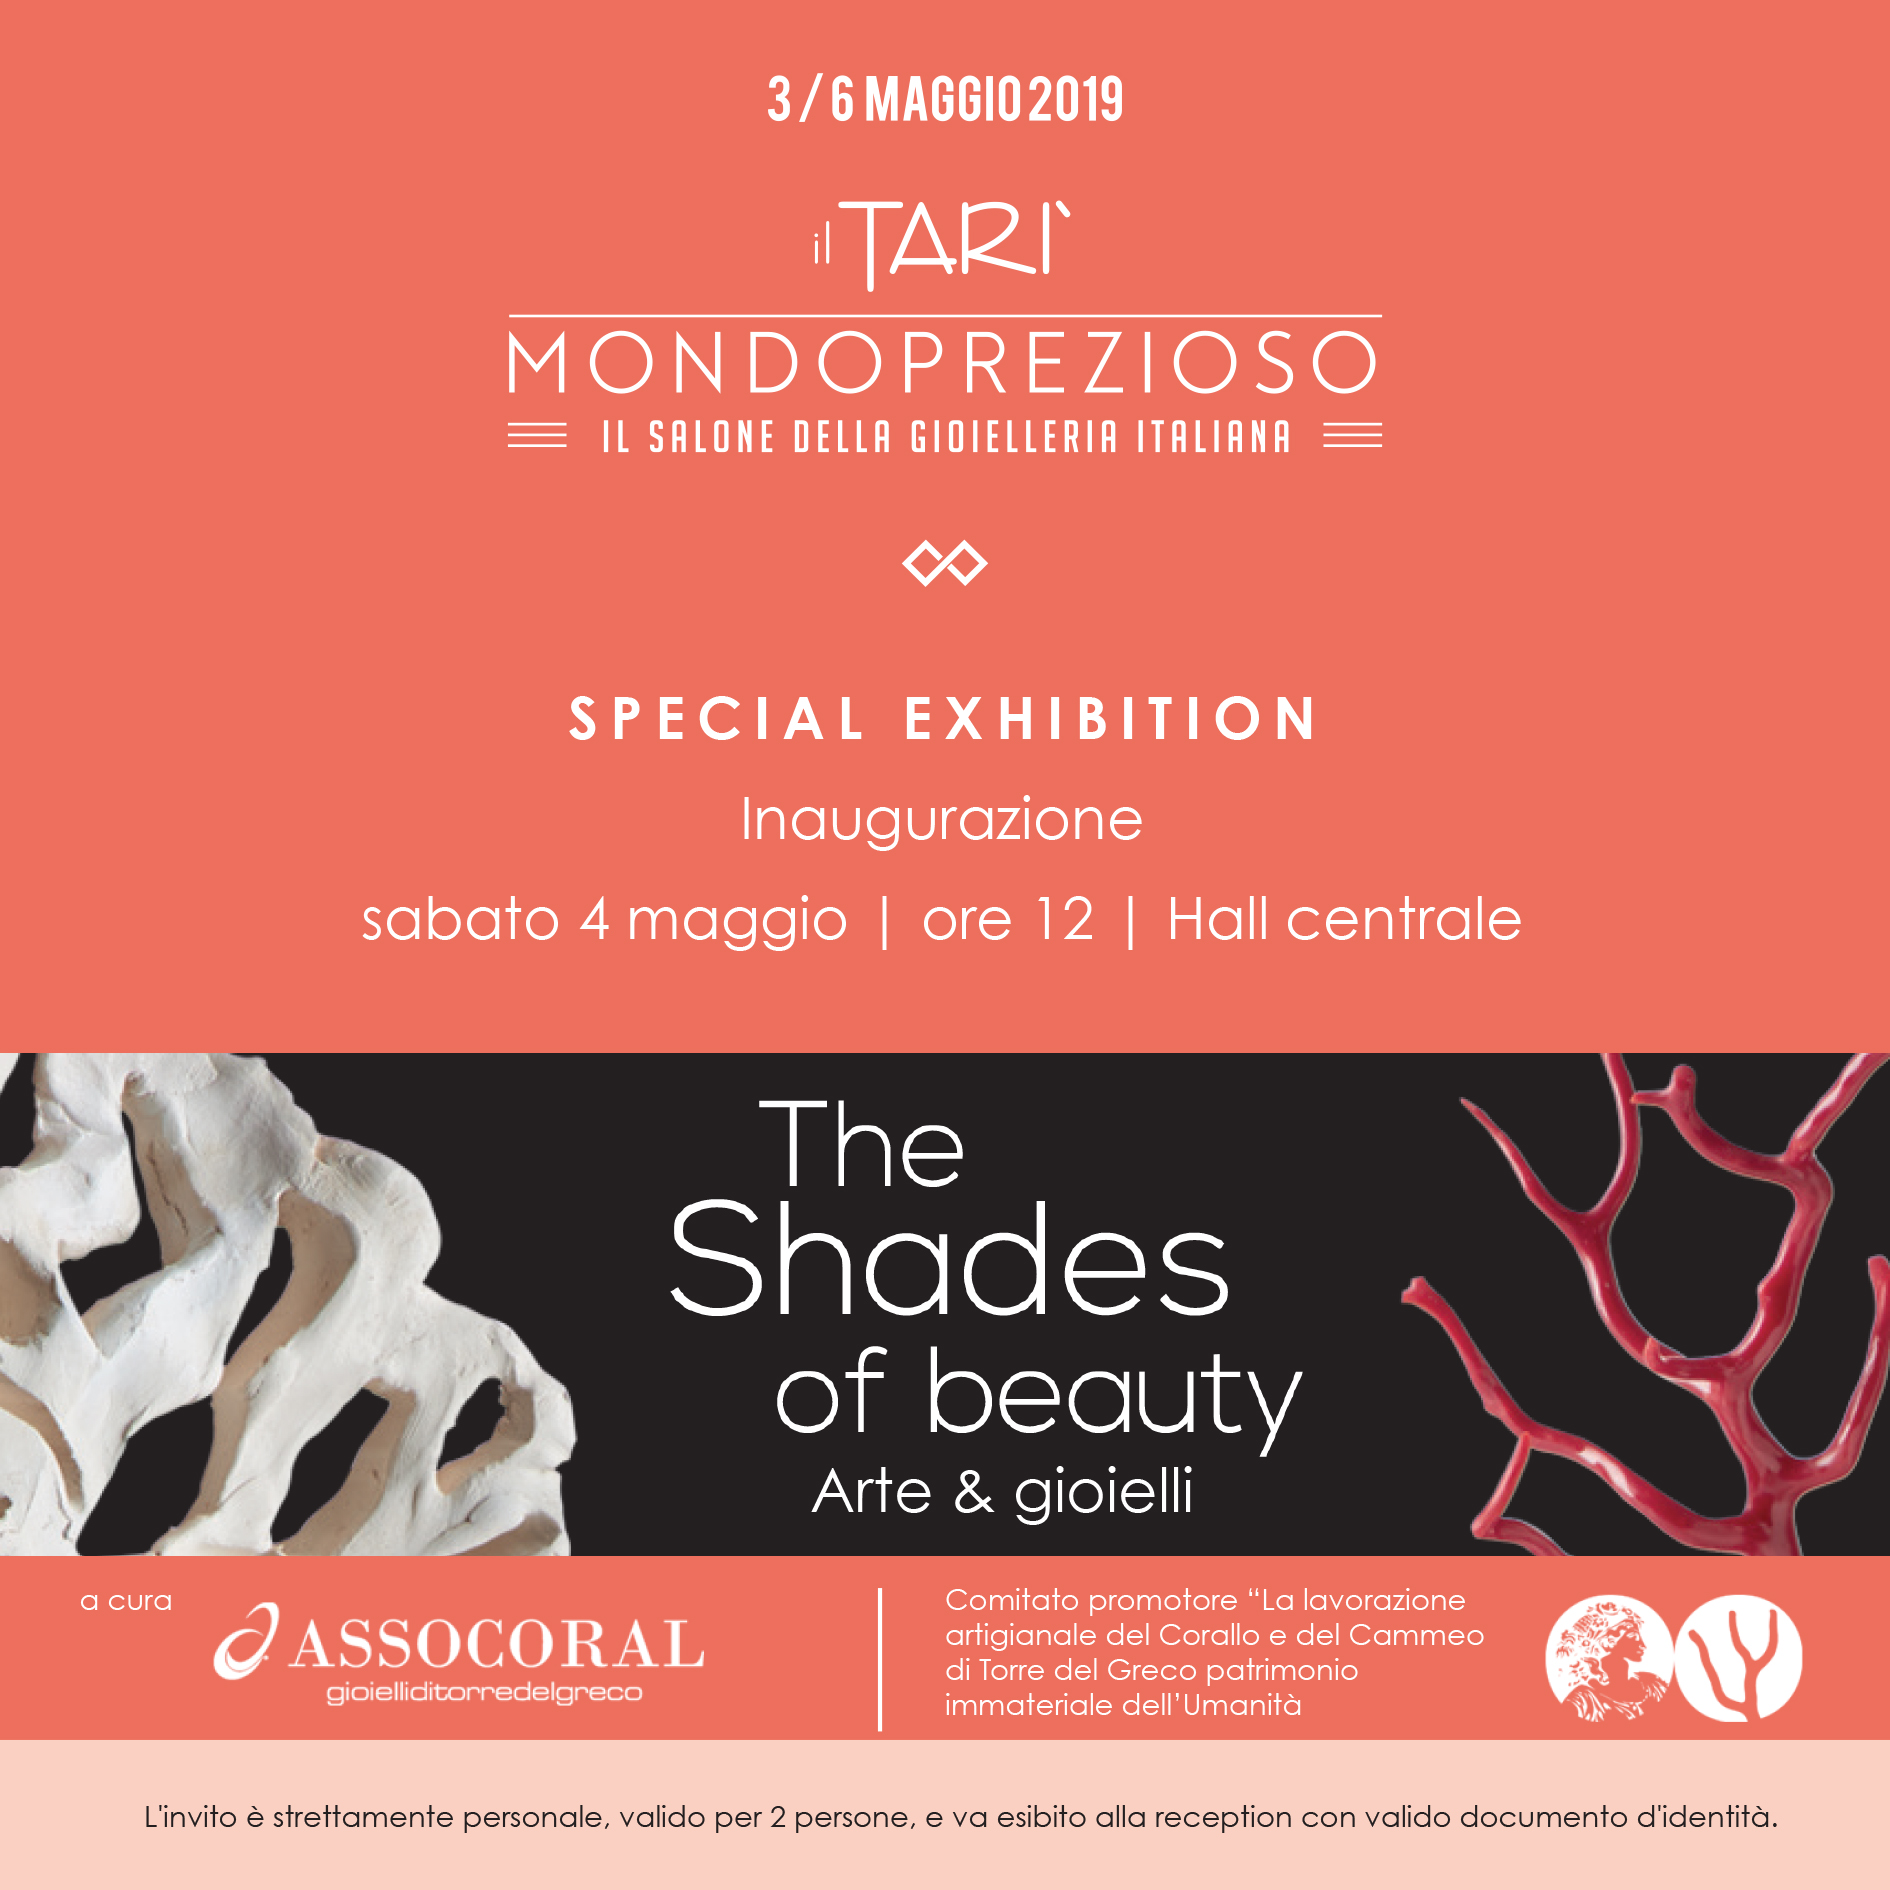 The Shades of Beauty al Tarì